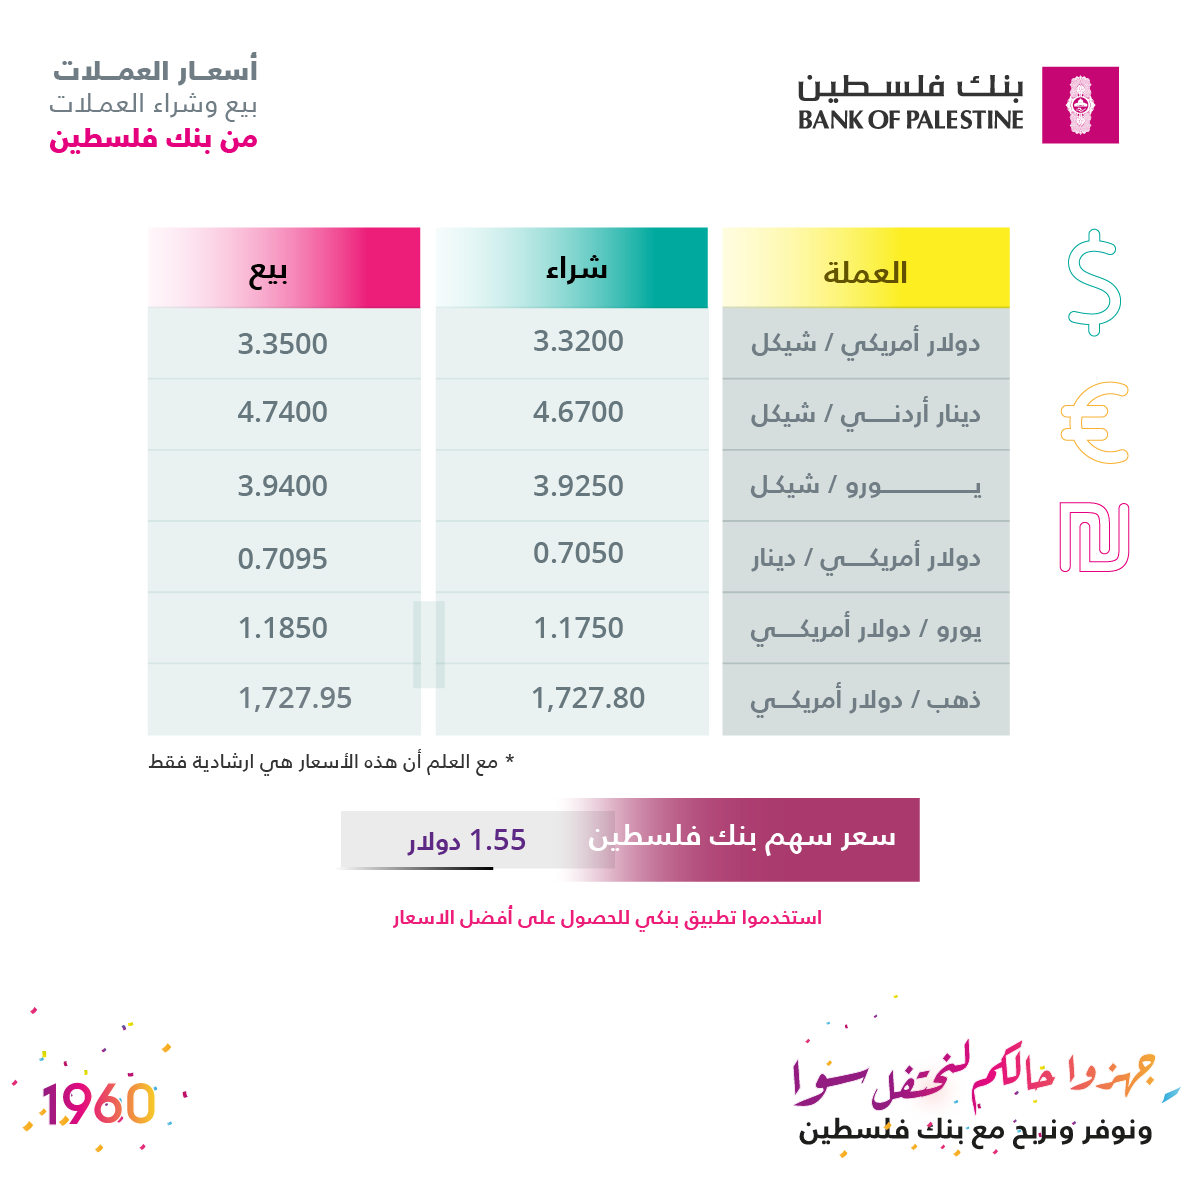 Bank Of Palestine Bankofpalestine Twitter